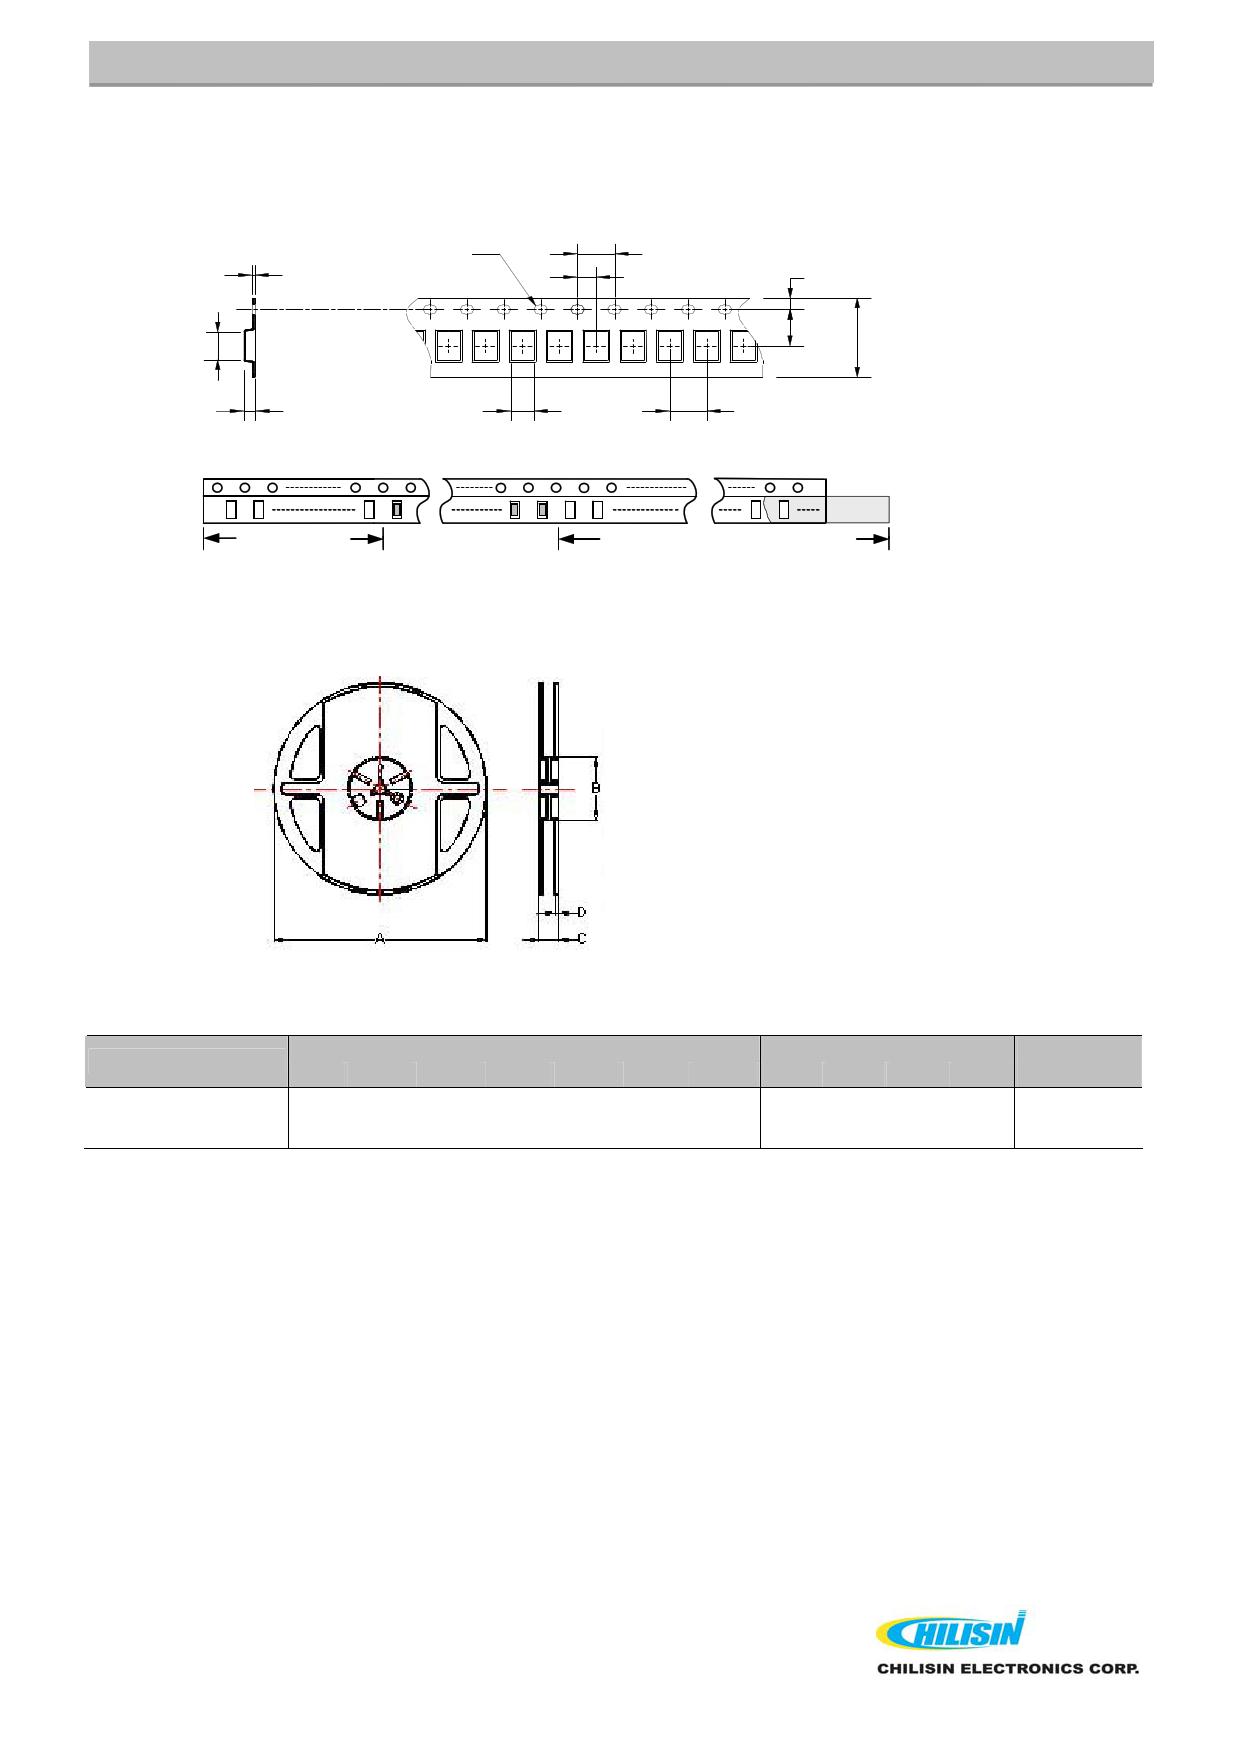 NLC252018 pdf, 반도체, 판매, 대치품